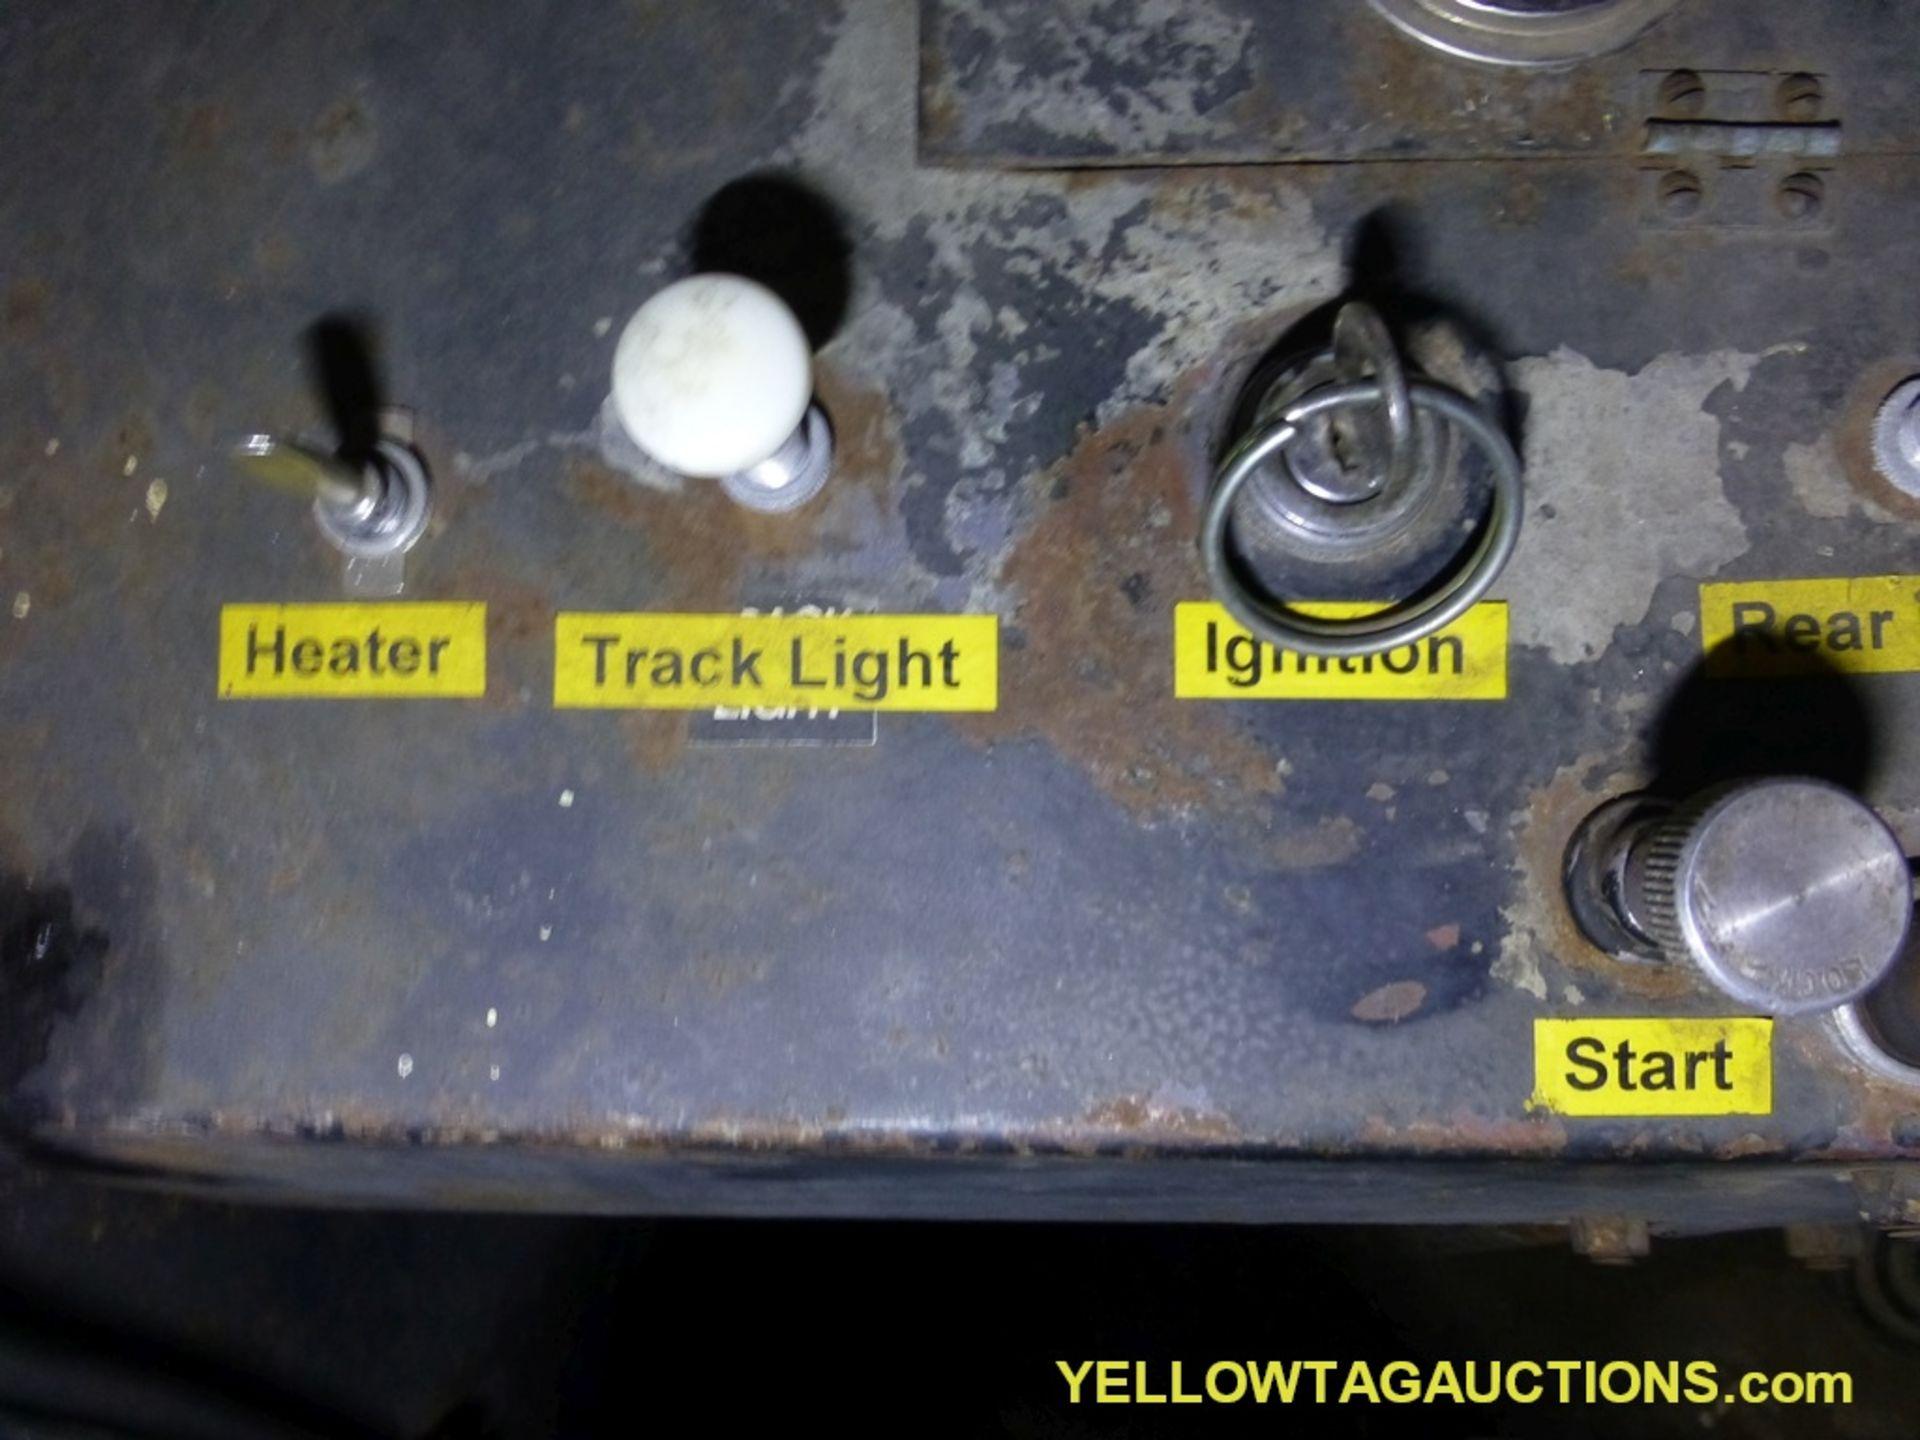 Track Mobile Rail Car Mover | Model No. 7TM; Bad Tie Rod - Image 13 of 42